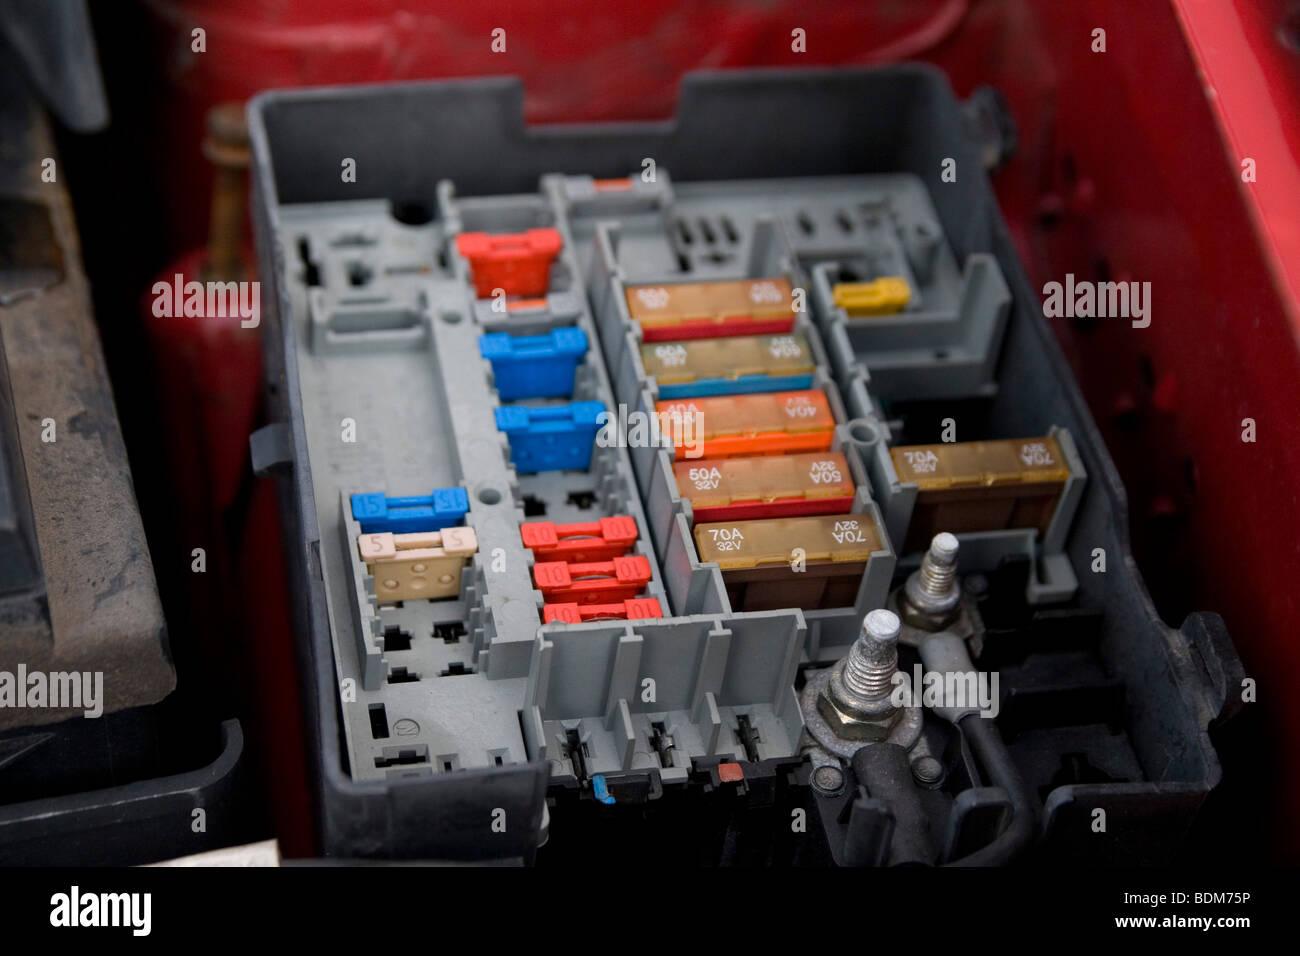 Citroen Berlingo 2007 Wiring Diagram Library Towbar Car Fuse Box Voltage Auto Electrical Rh Mit Edu Uk Hardtobelieve Me